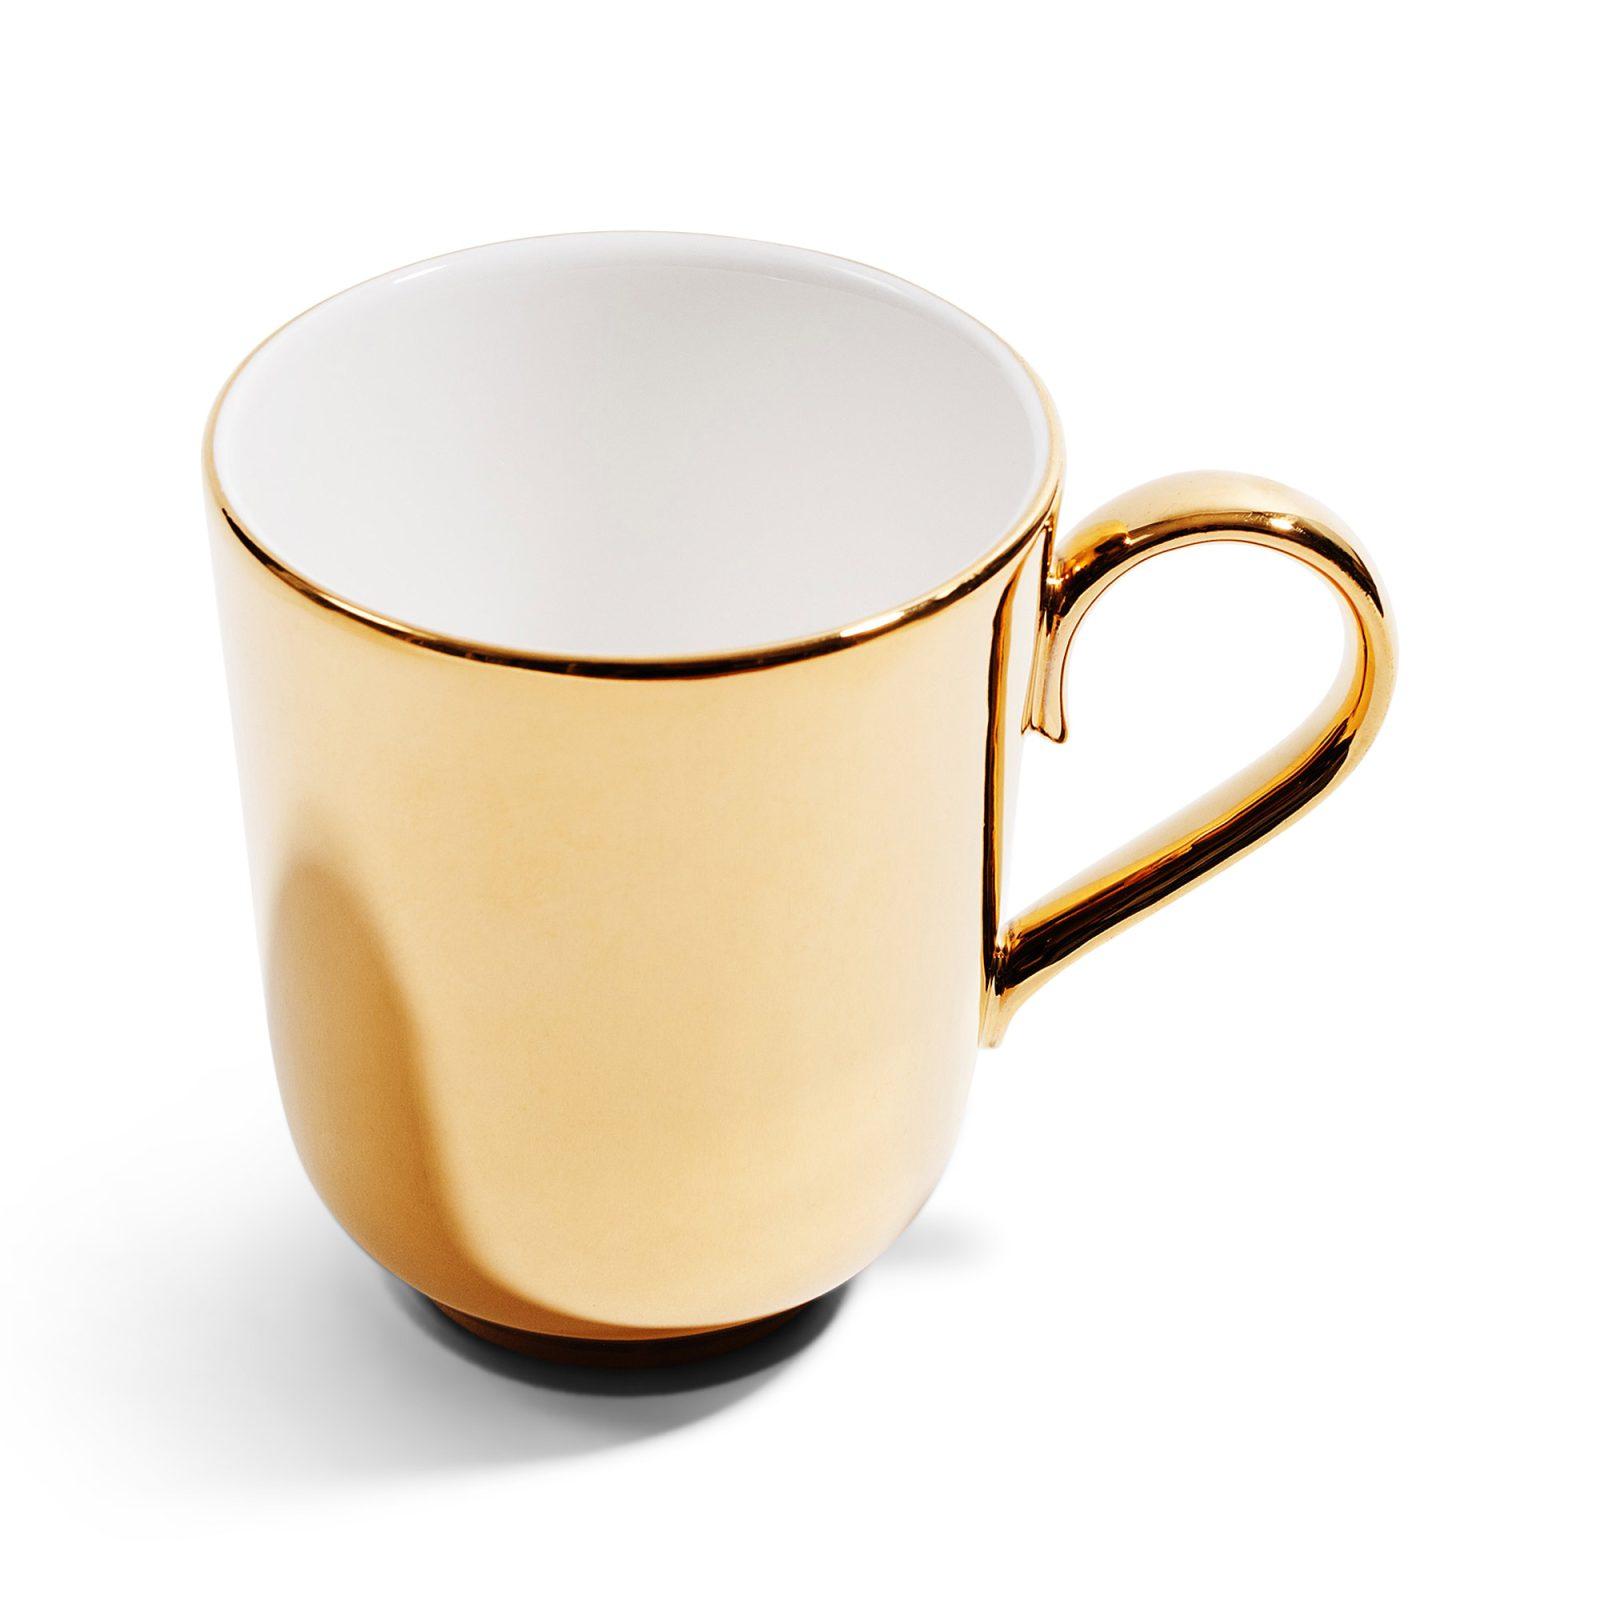 gold-espresso-cup–saucer-superstripe-2